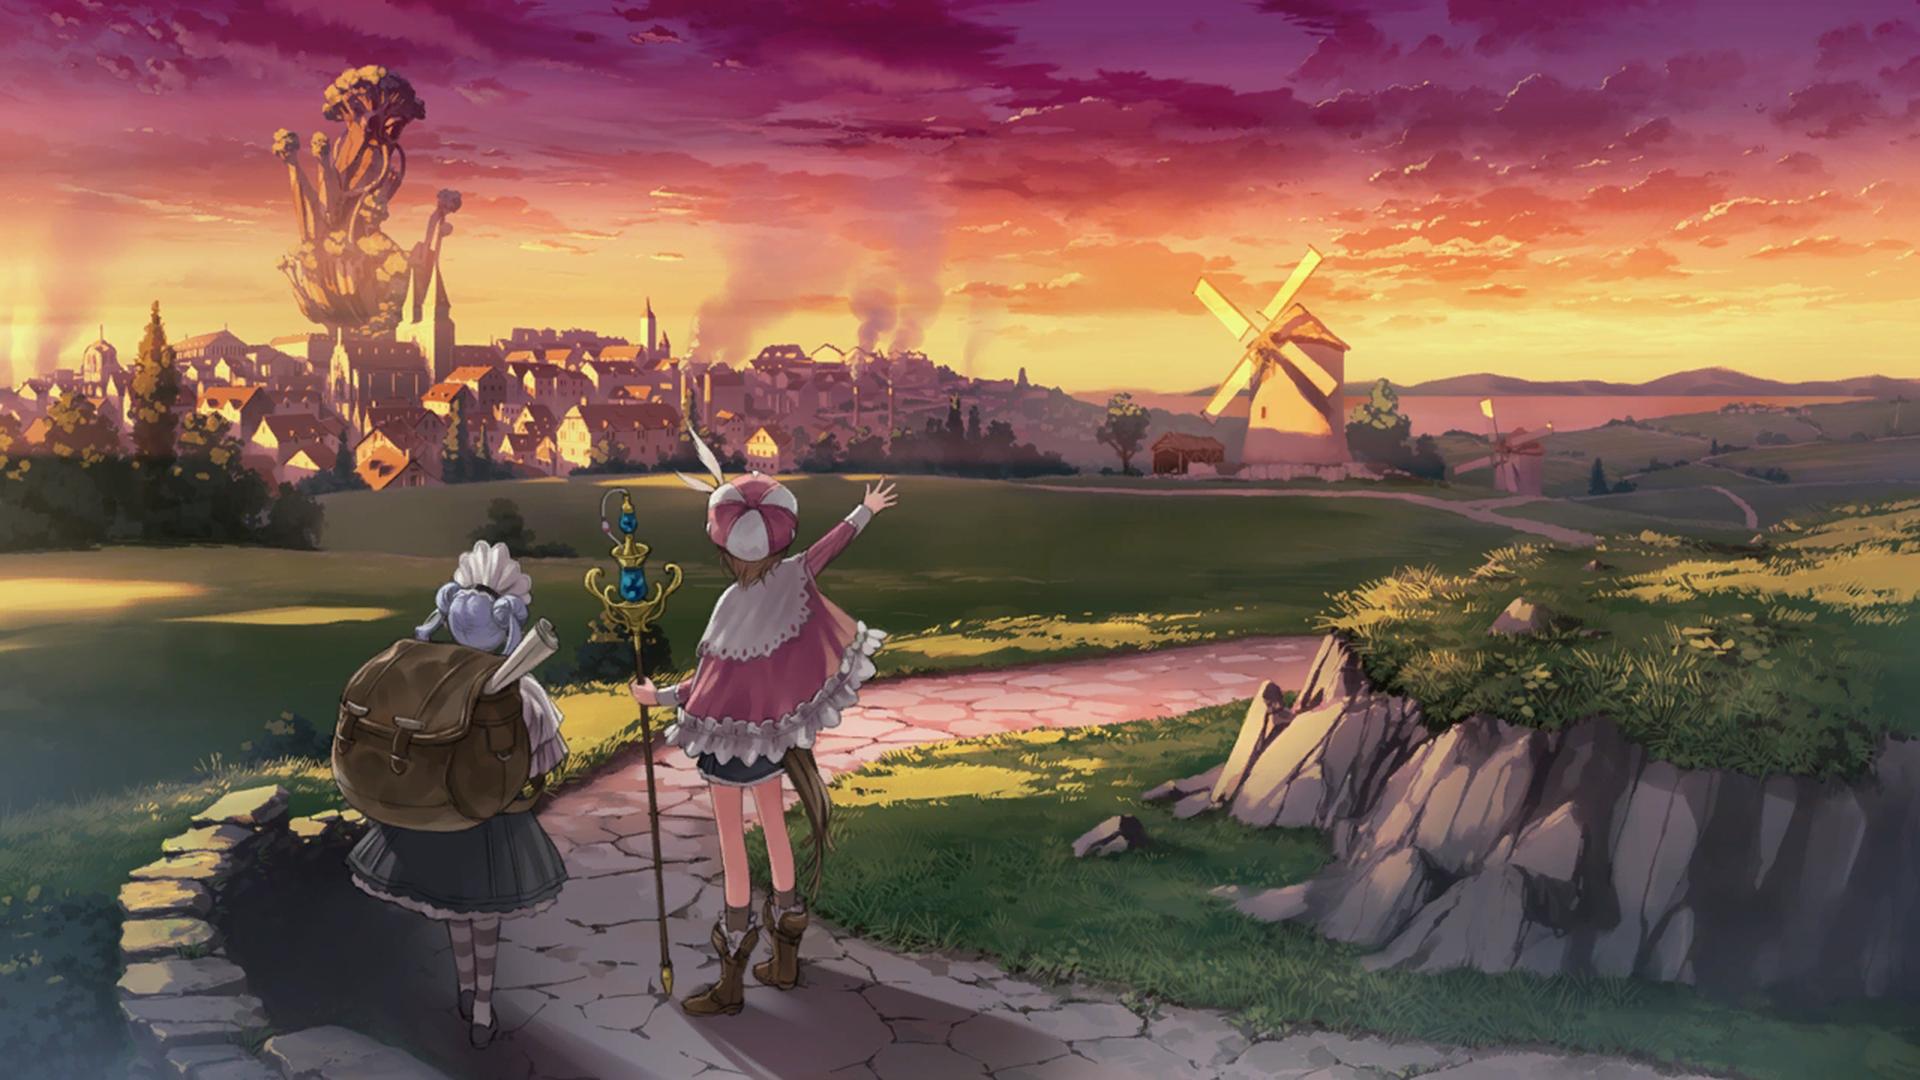 Atelier Rorona The Alchemist of Arland Wallpaper 030